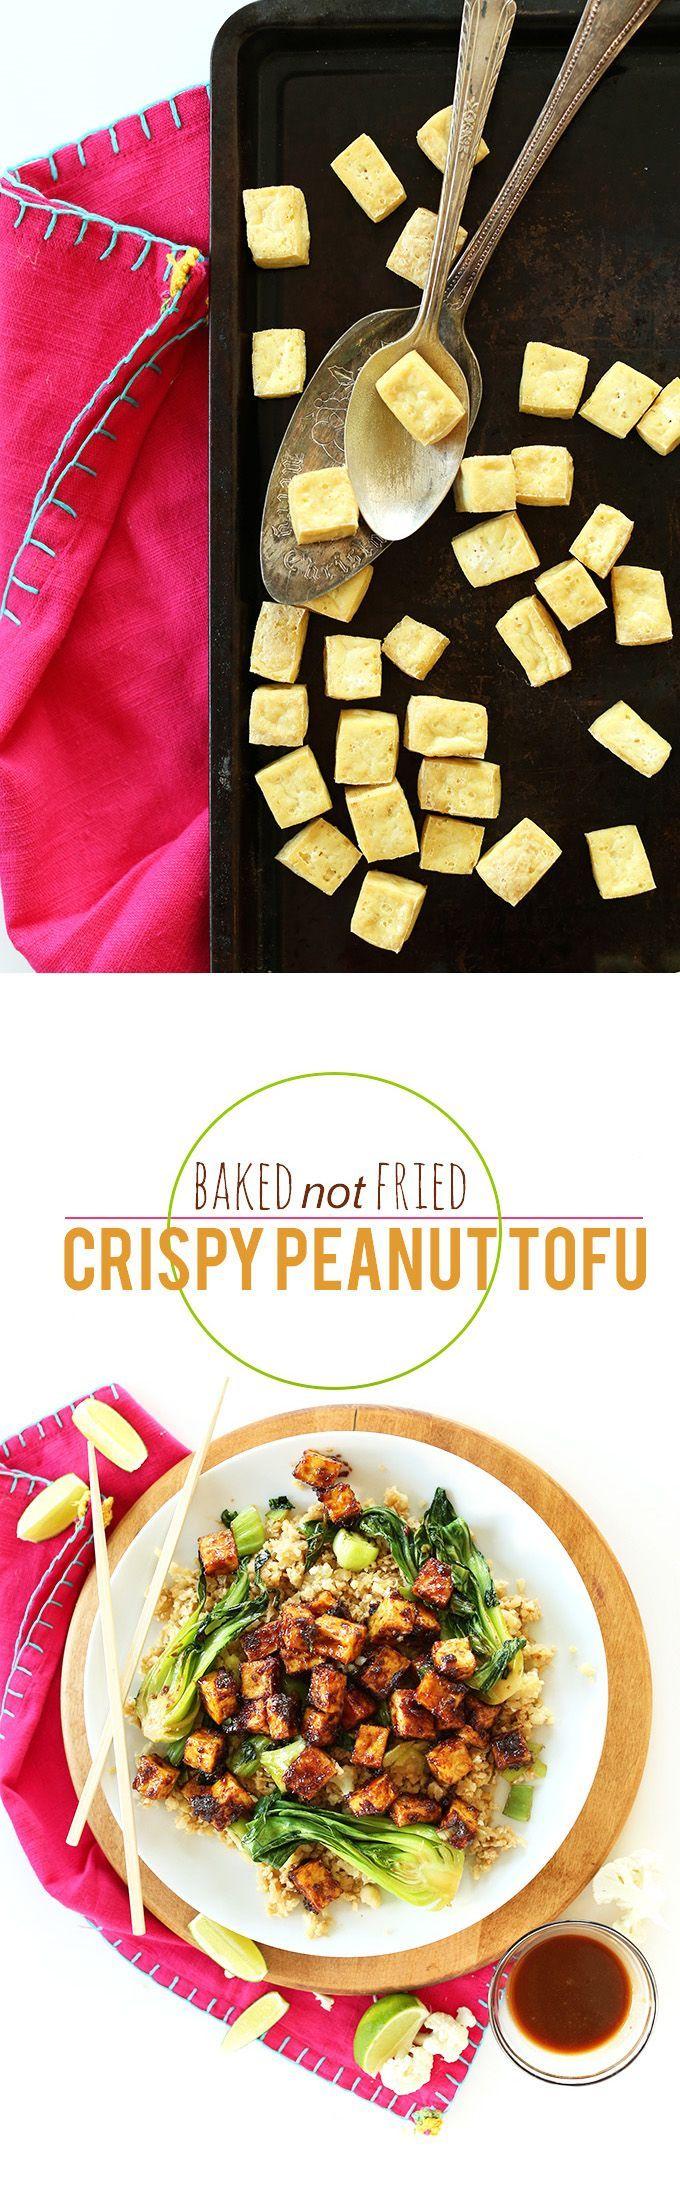 Baked Not Fried Crispy Tofu! 5-ingredient glaze, cauliflower rice, sauteed veggies